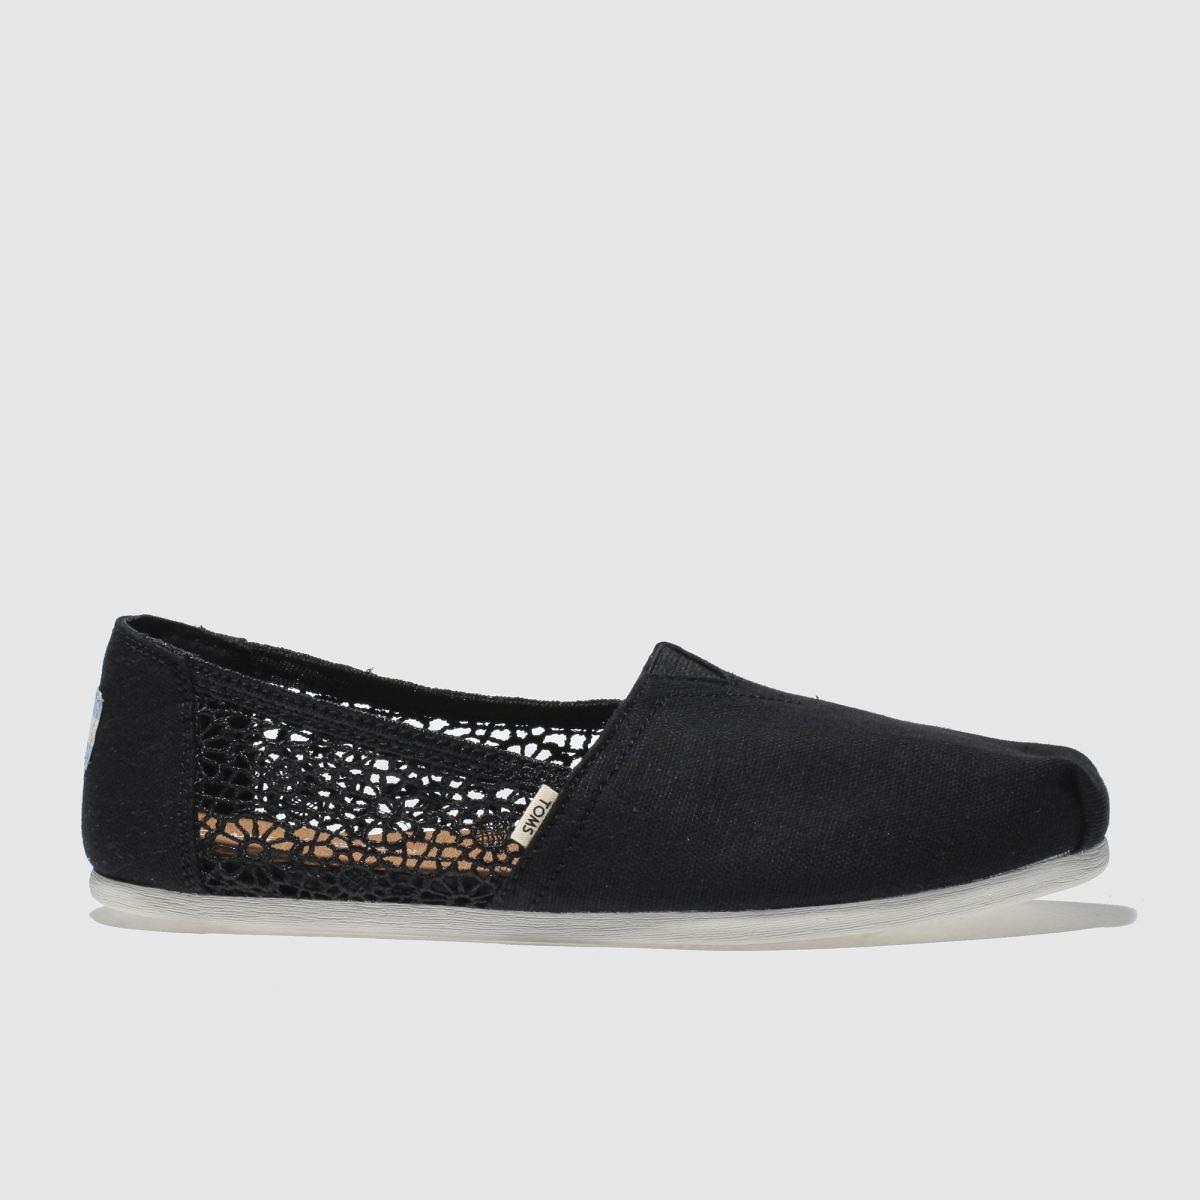 Toms Black Classic Hemp Crochet Flat Shoes